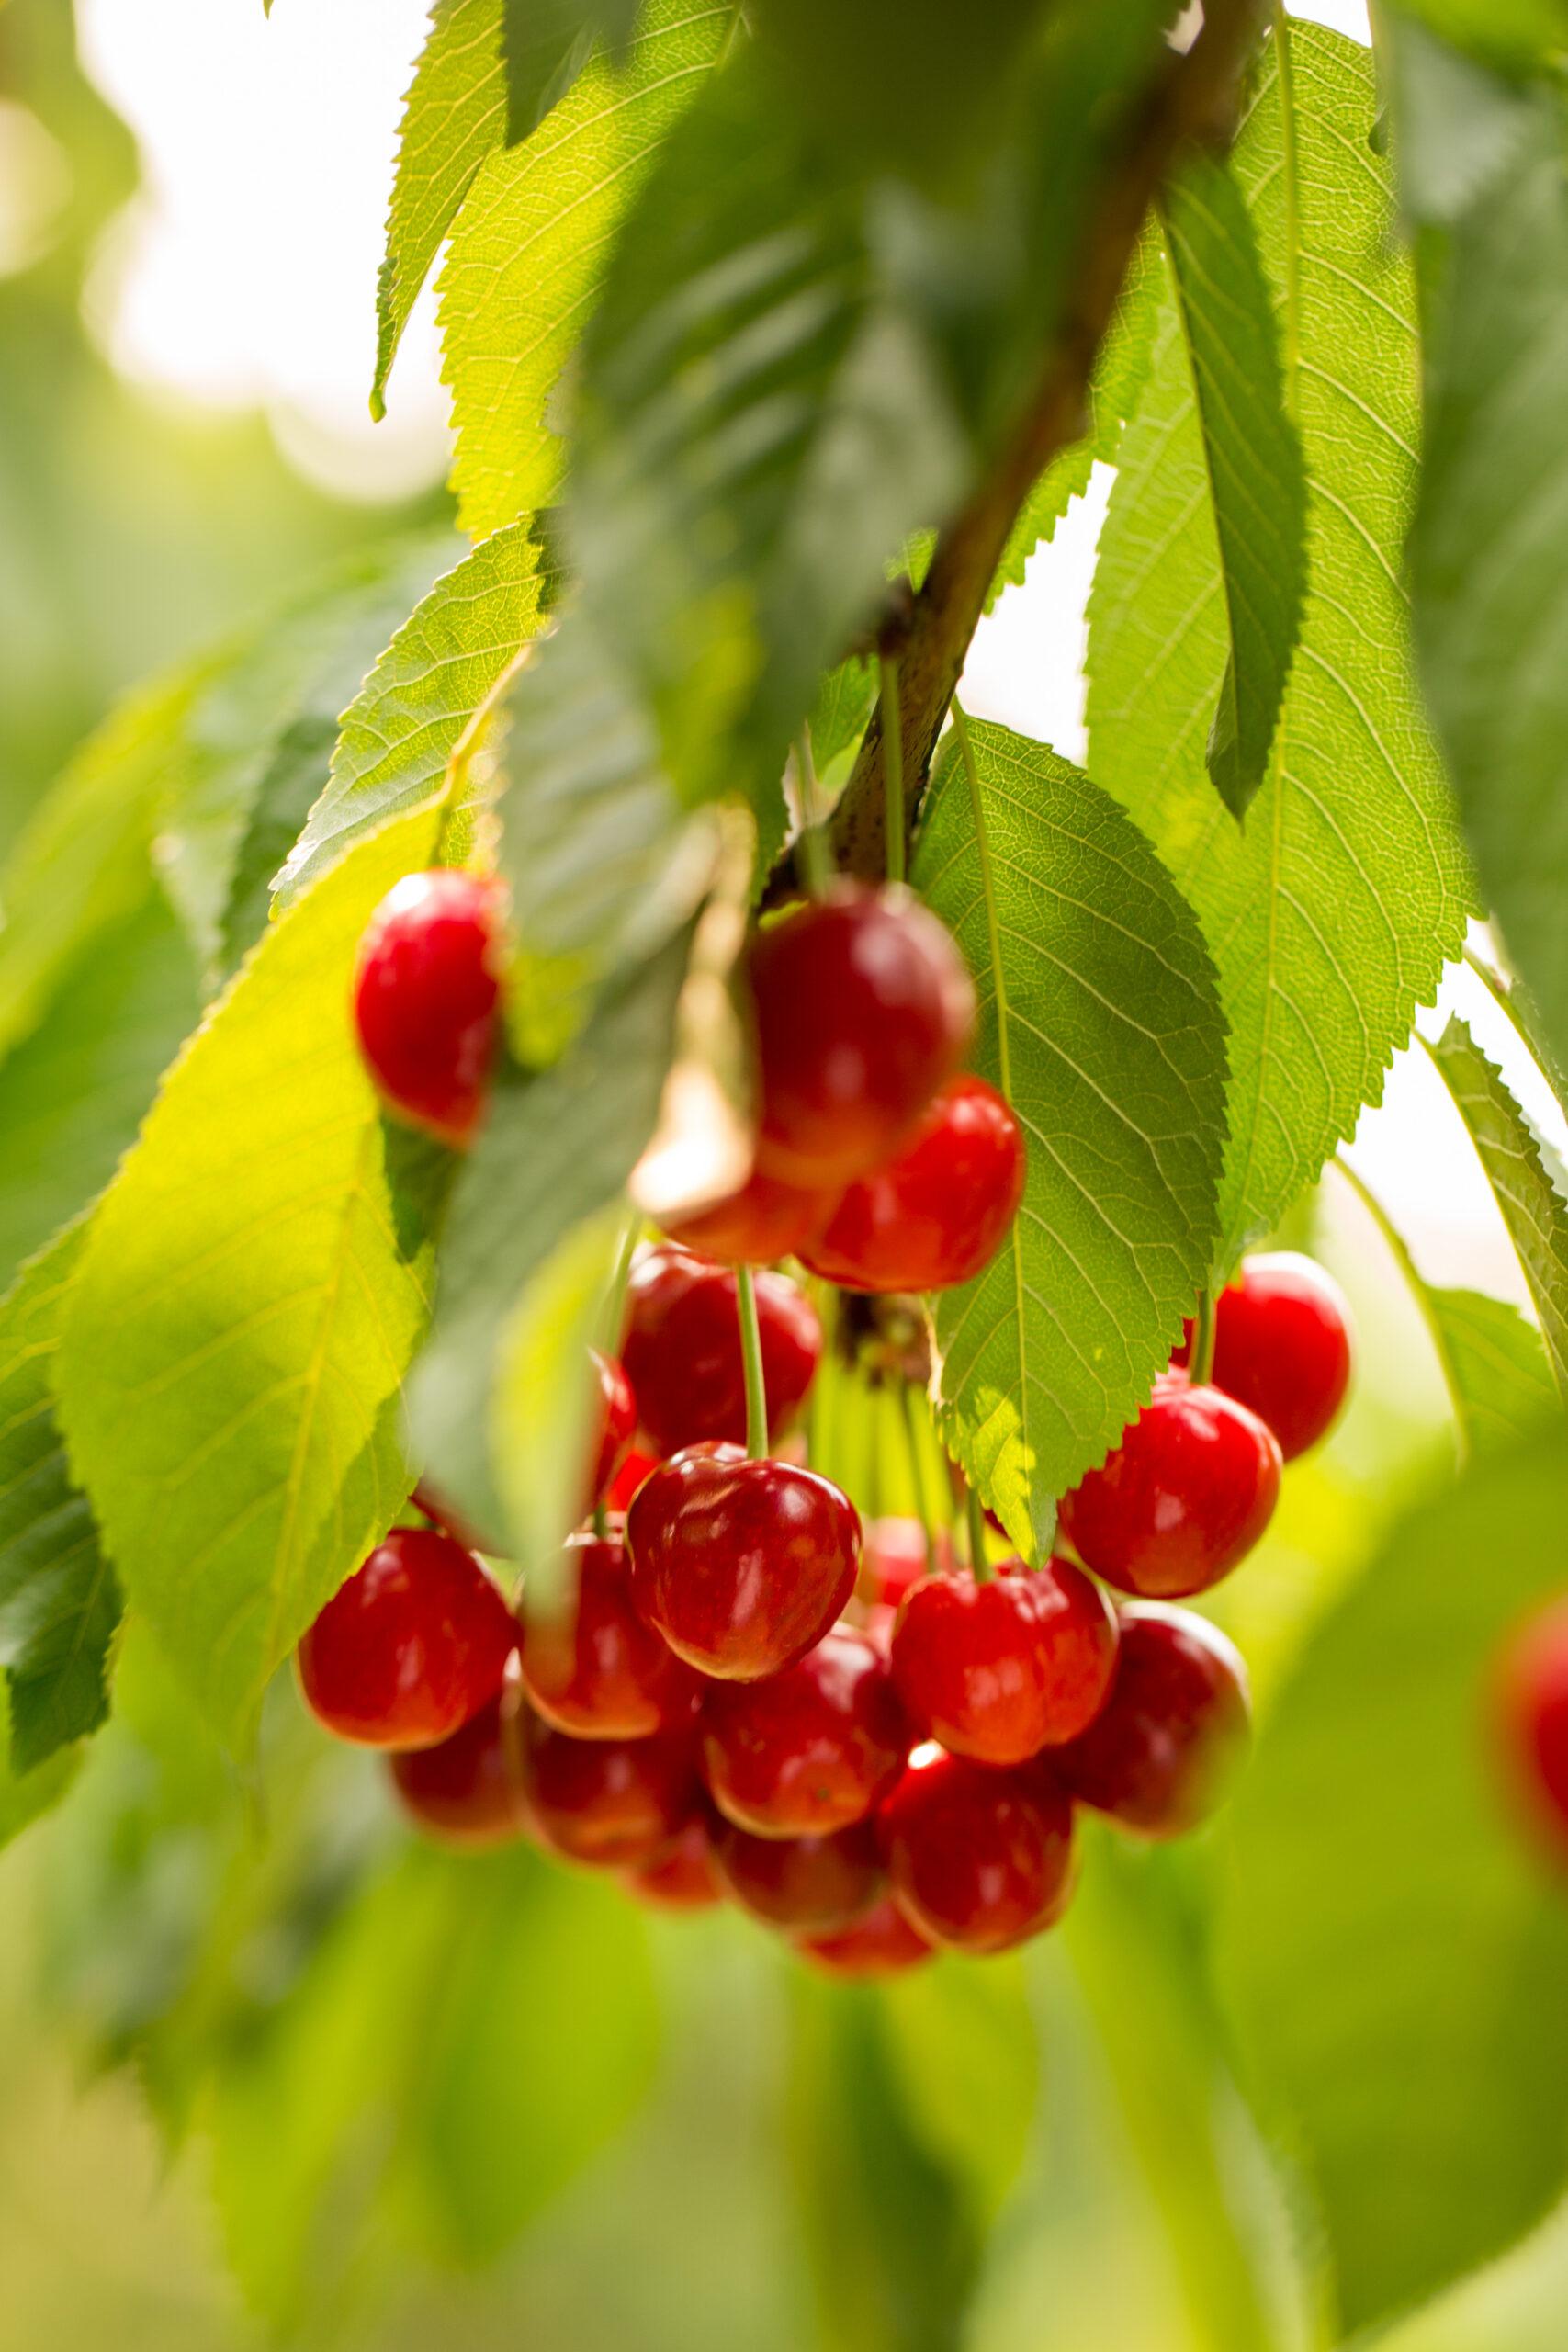 cherries on a tree